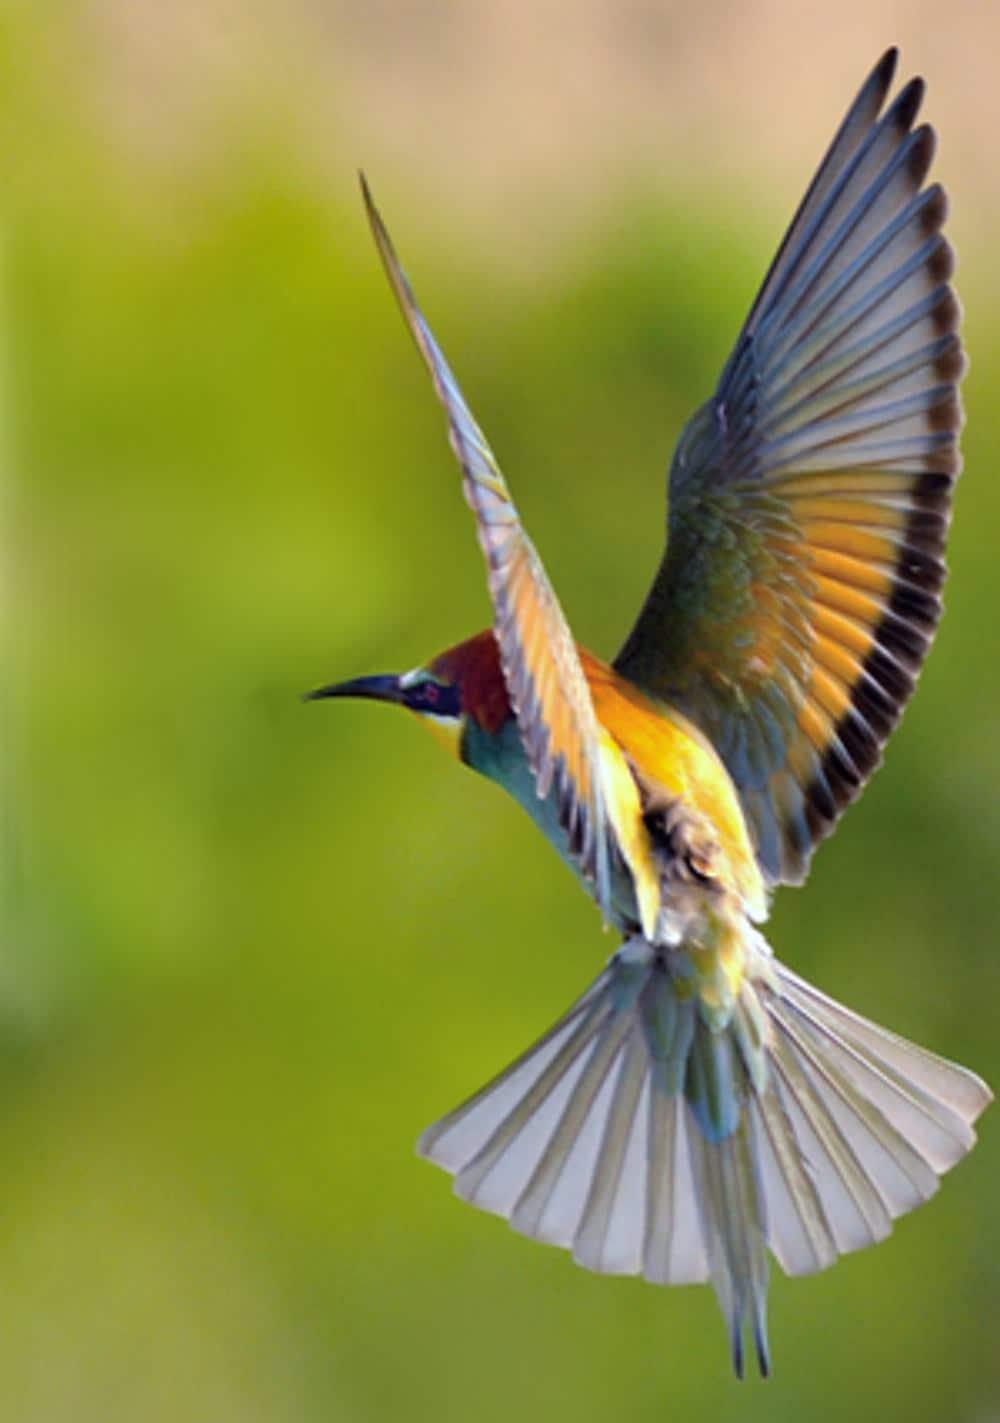 PAM-logger on European bee-eater. Image credit: Bernd Skerra 2016